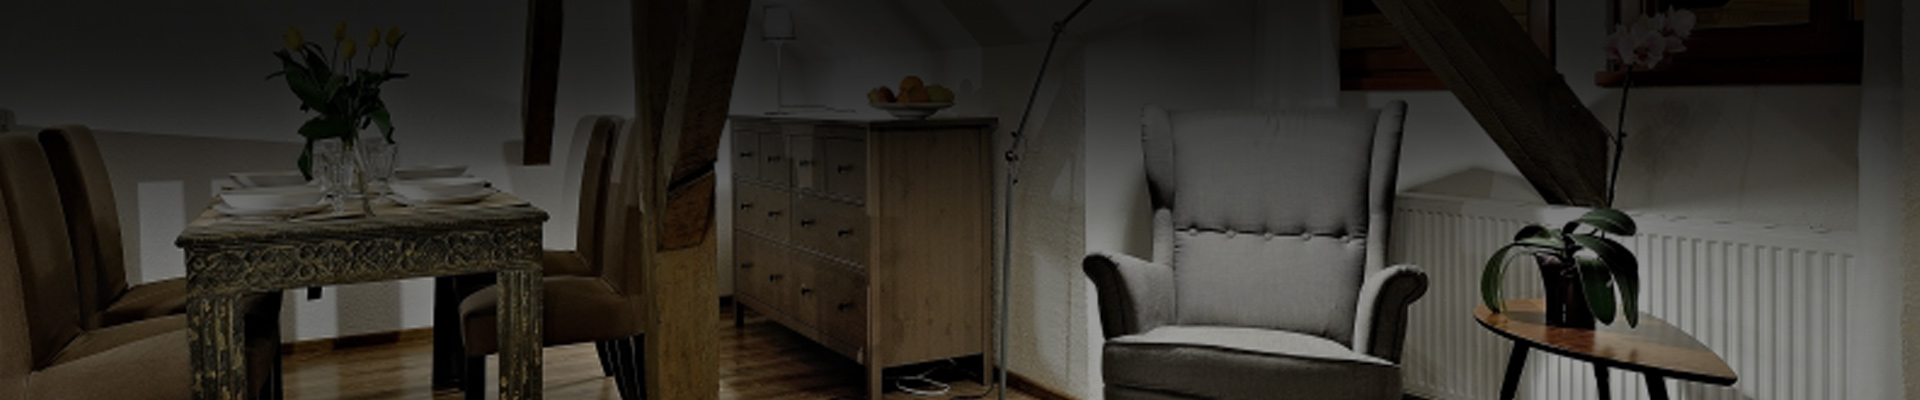 Apartamenty-Apartamenty